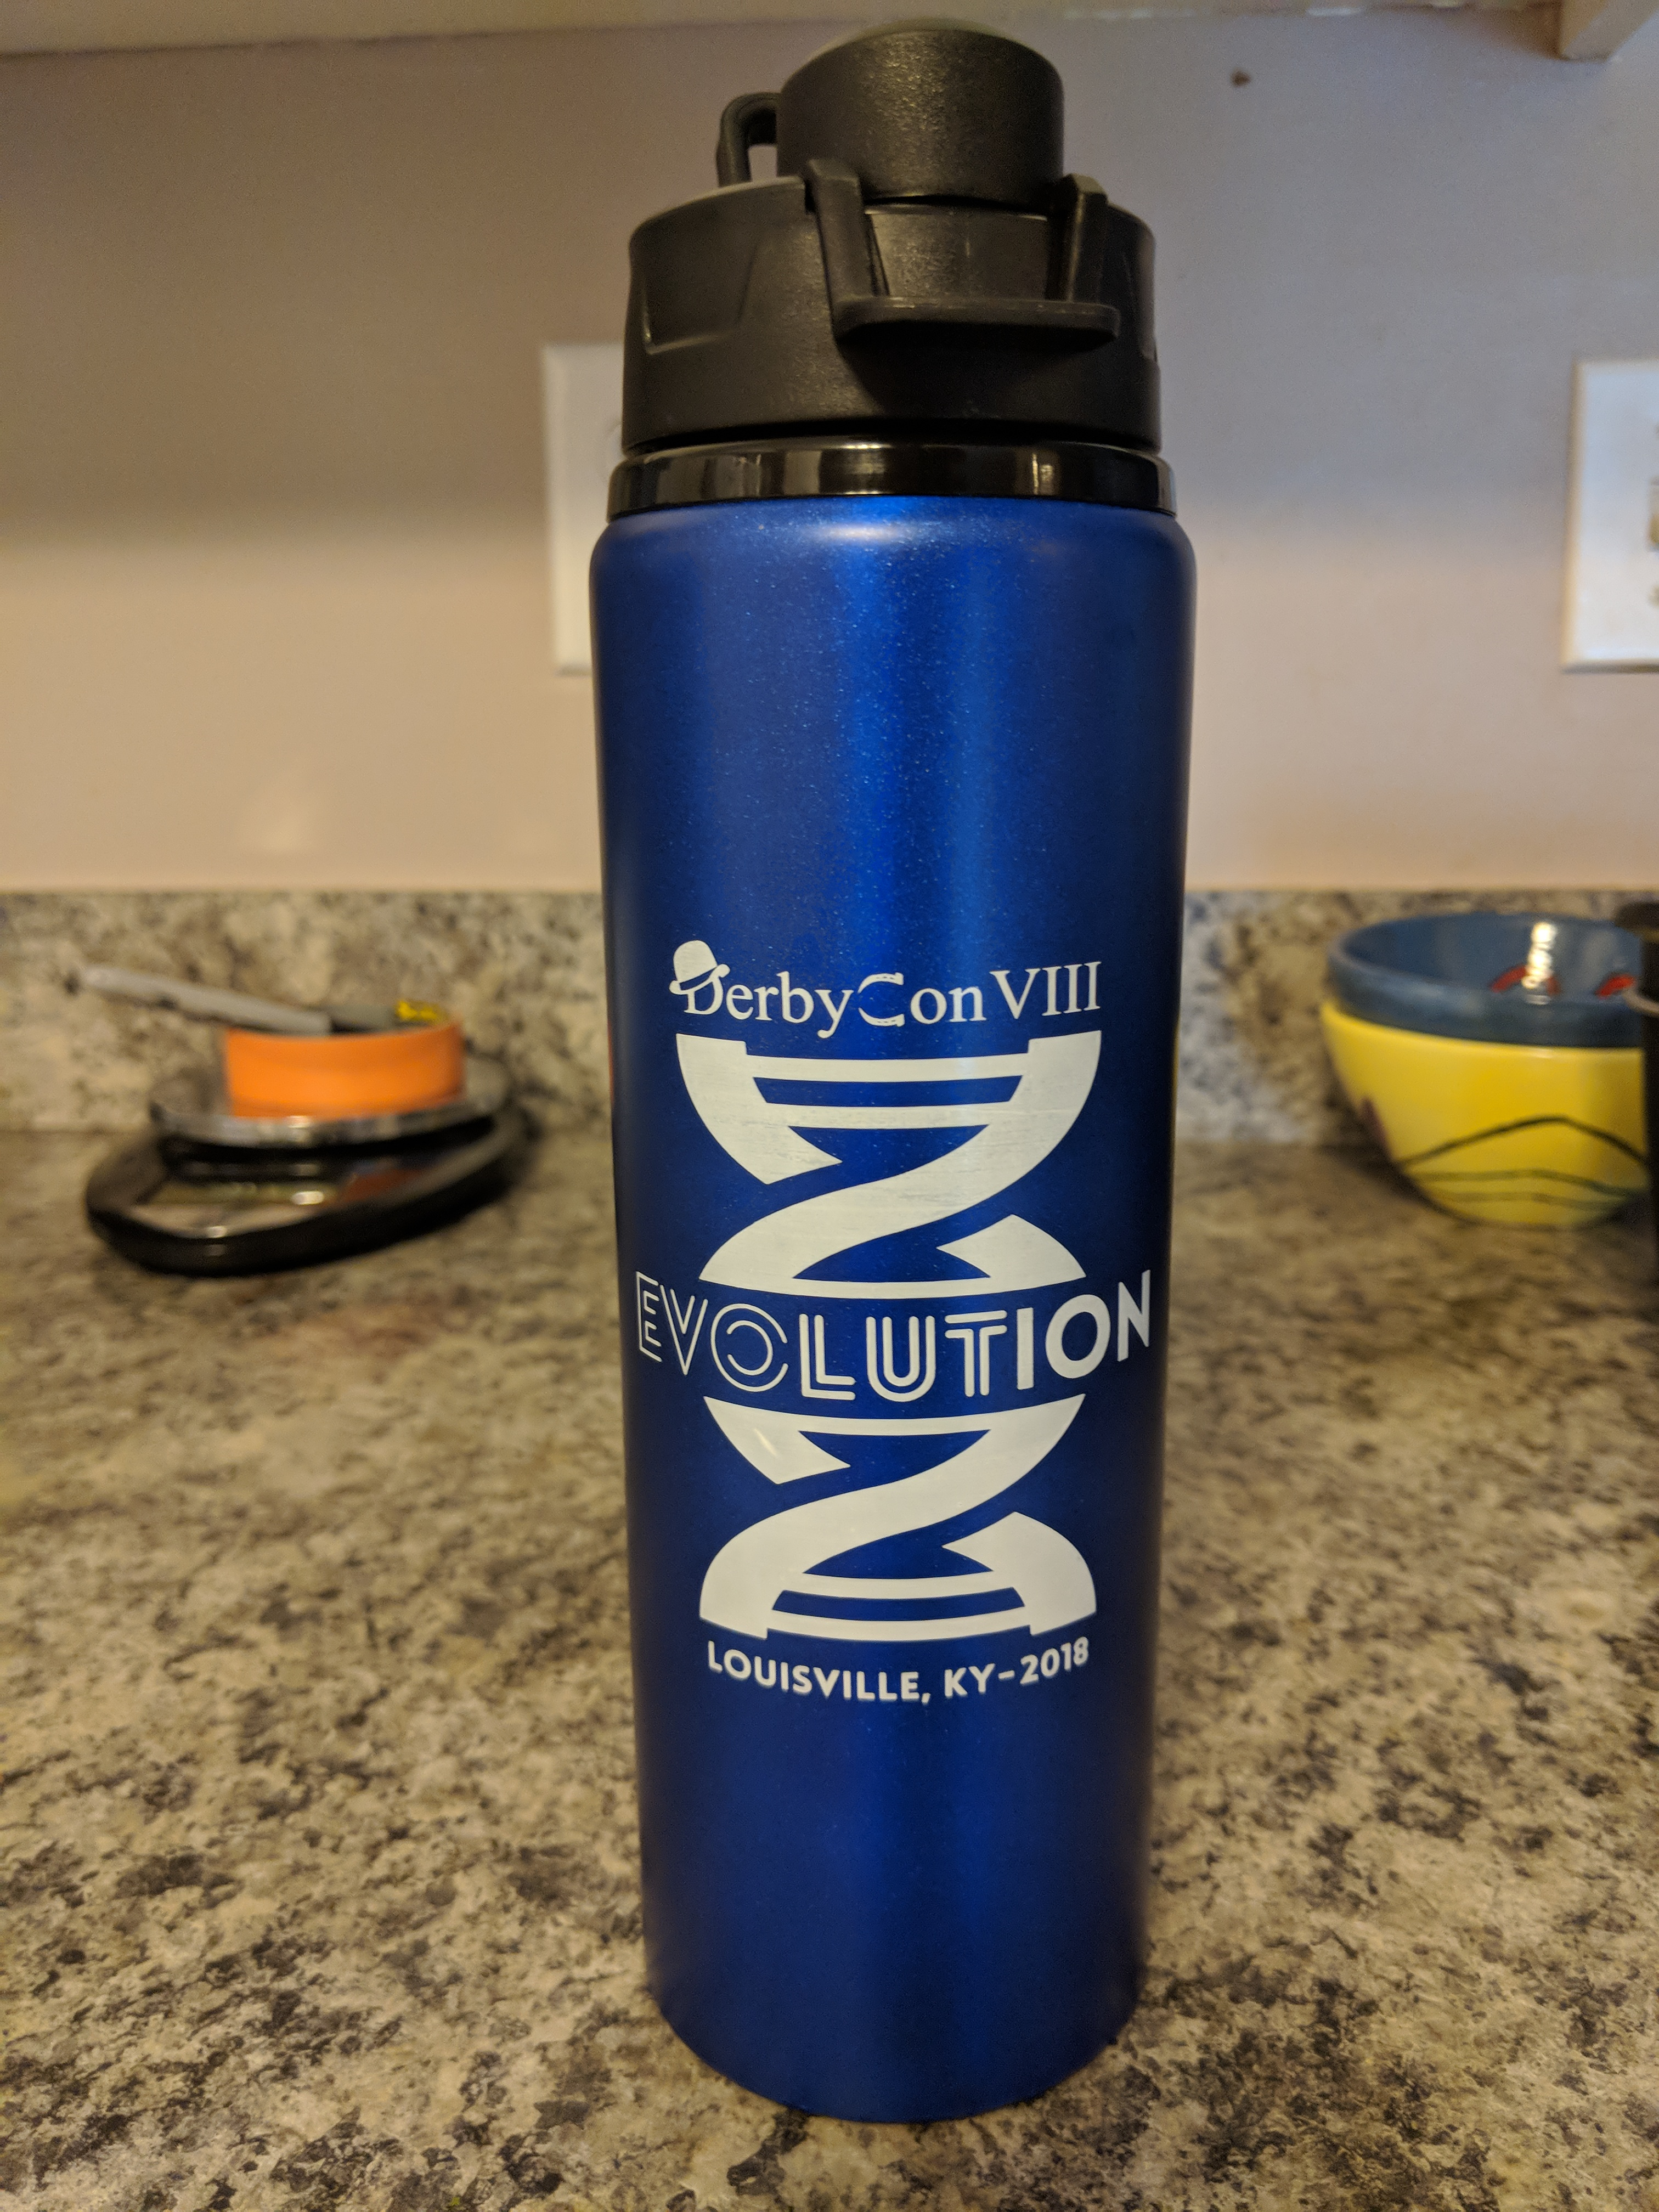 DerbyCon 8 - Evolution | doyler net